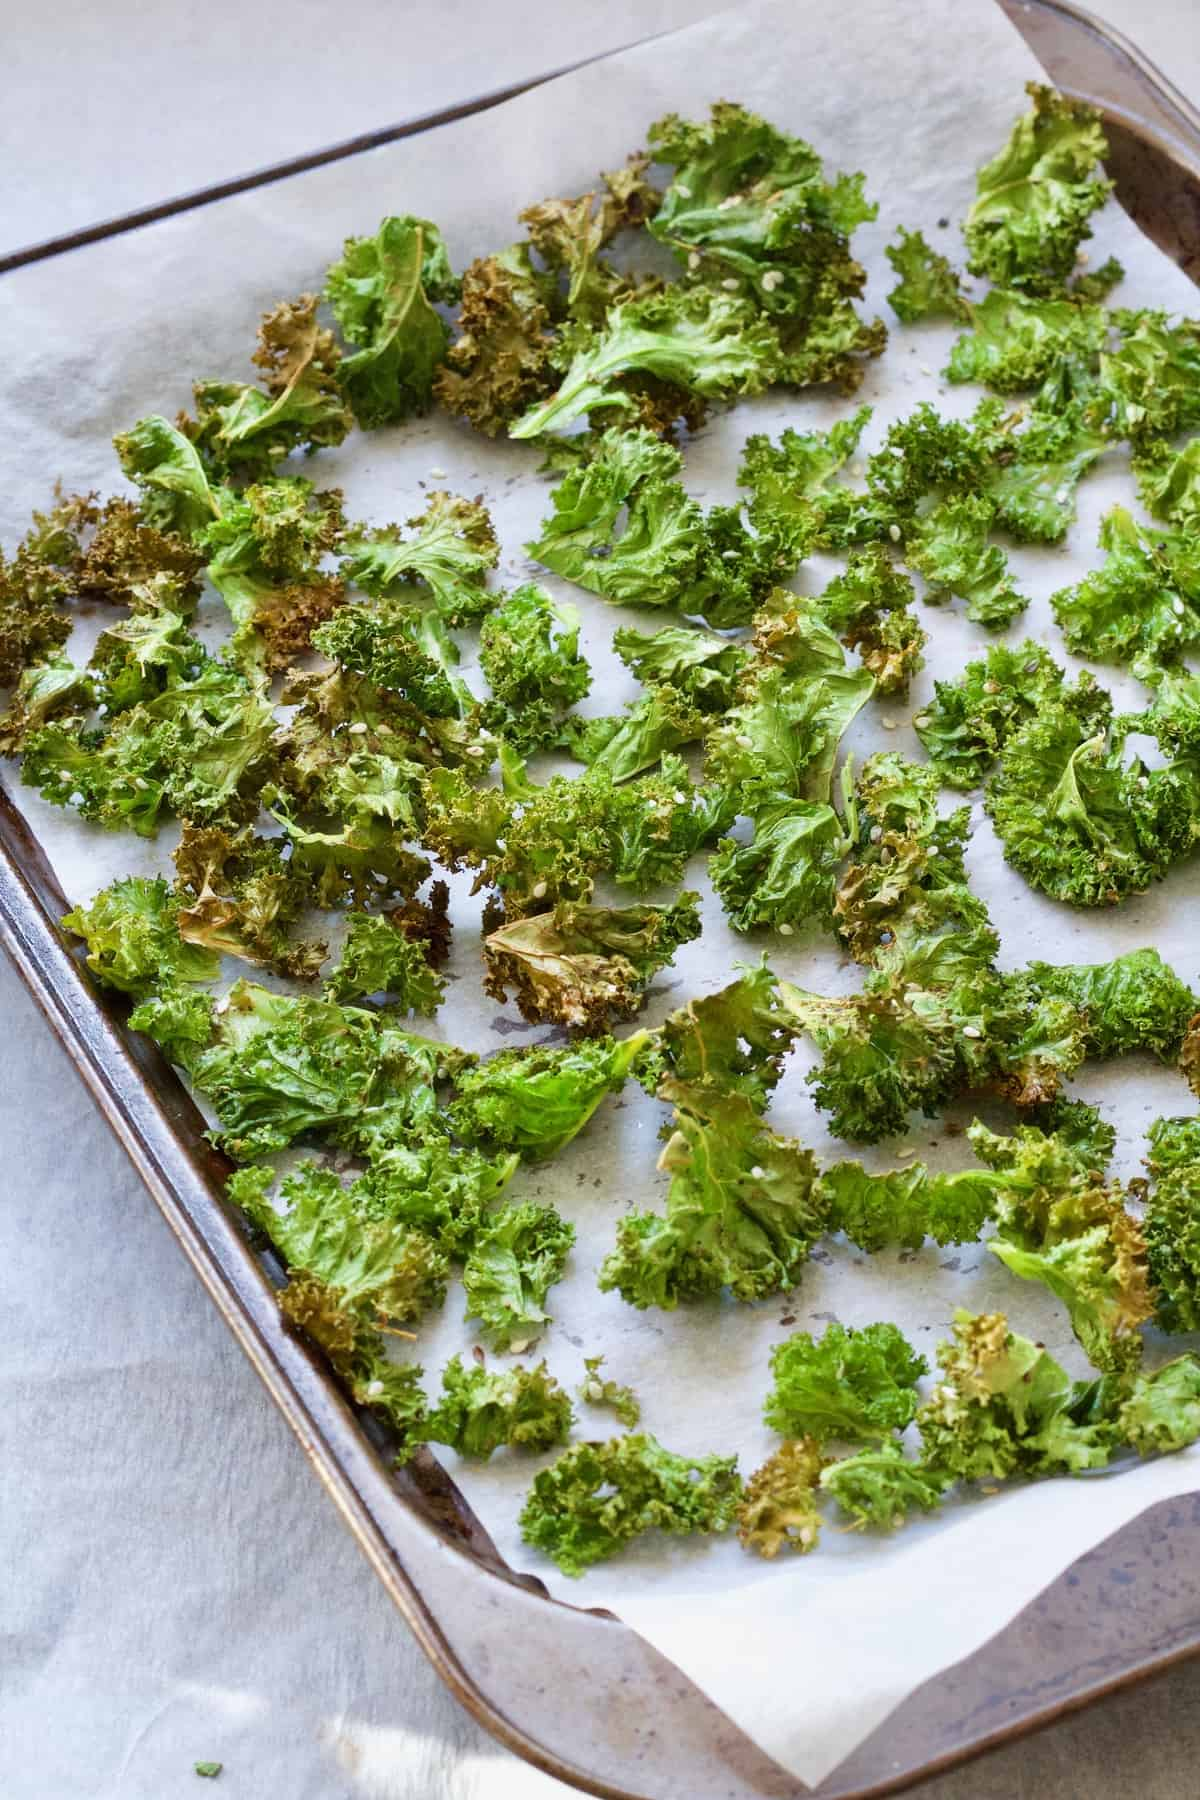 Baked kale crisps on a baking tray.